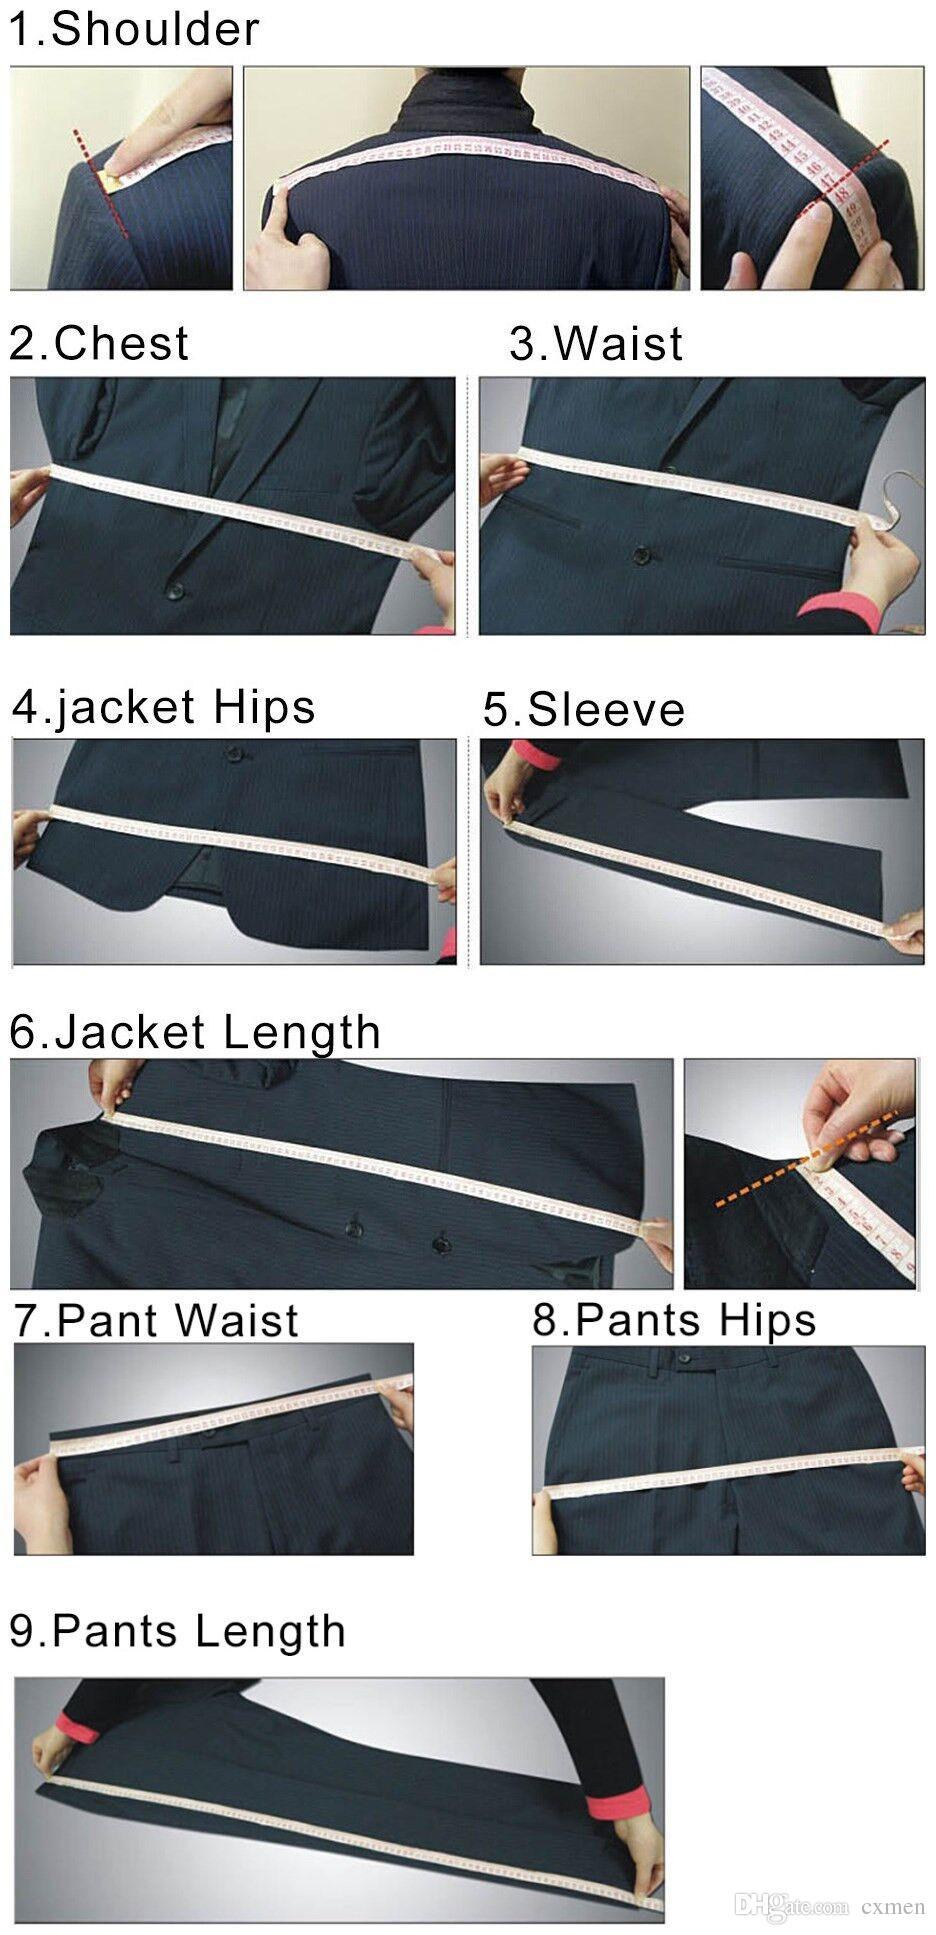 Custom Made Black Men Suits for Wedding Groom Peaked Laple Men Blazer Tuxedos Formal Prom Groomsmen Jacket+Pants